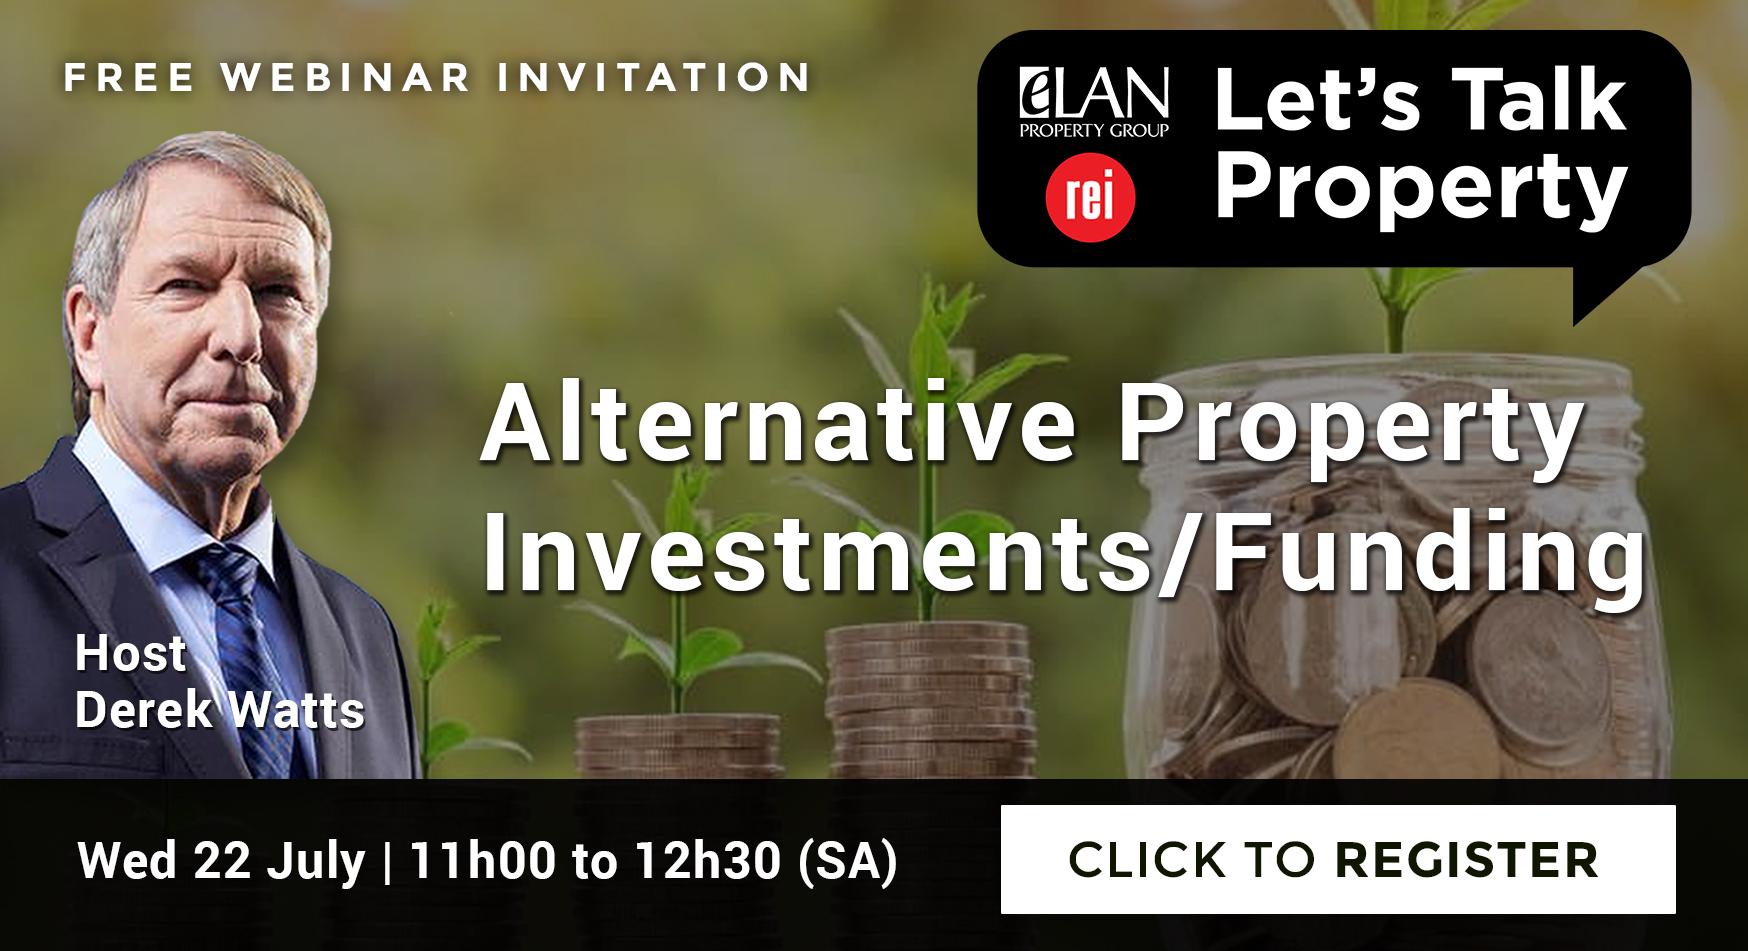 Alternative Property Investments/Funding